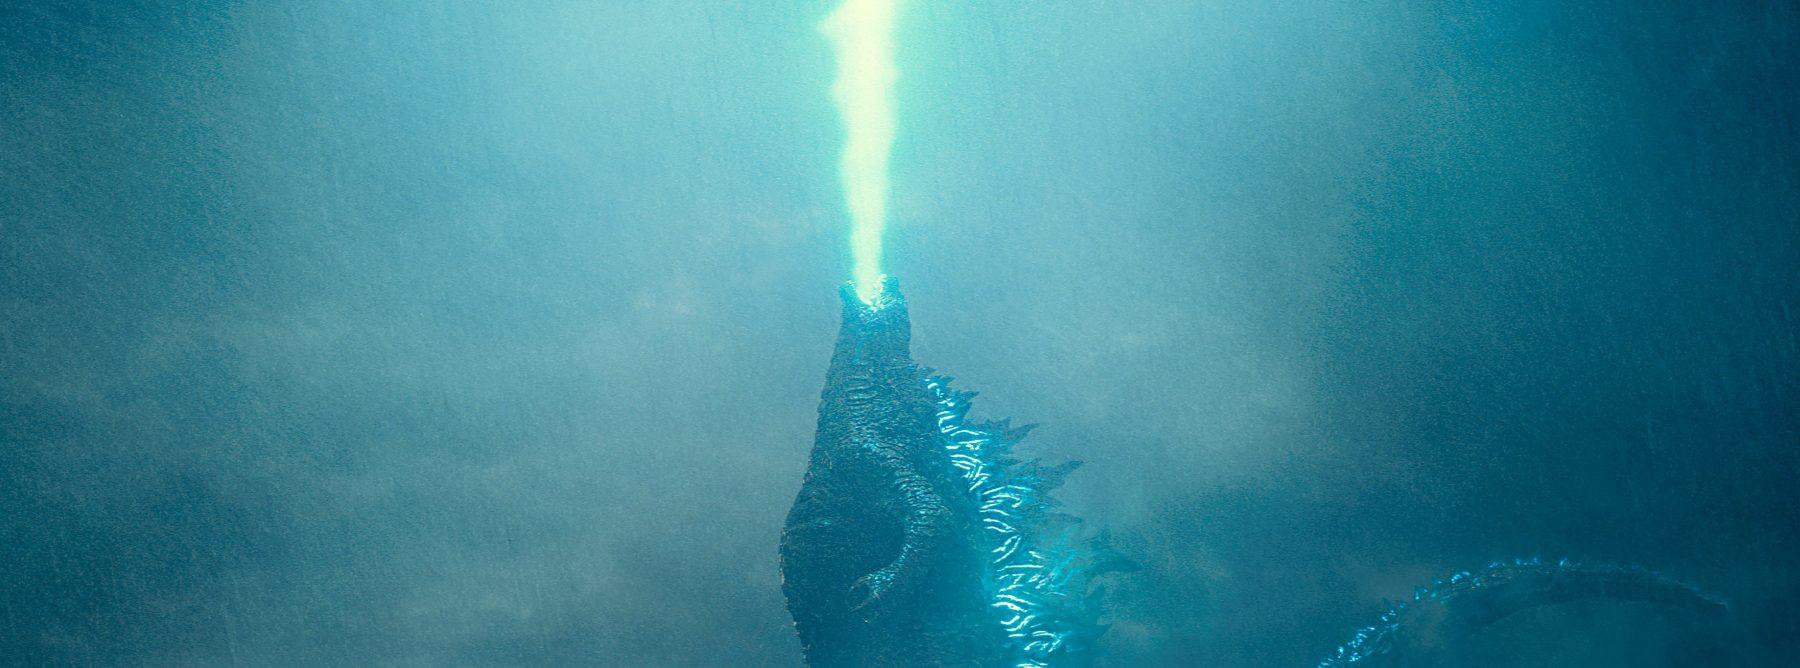 """Godzilla: King of Monsters"" from Warner Bros."